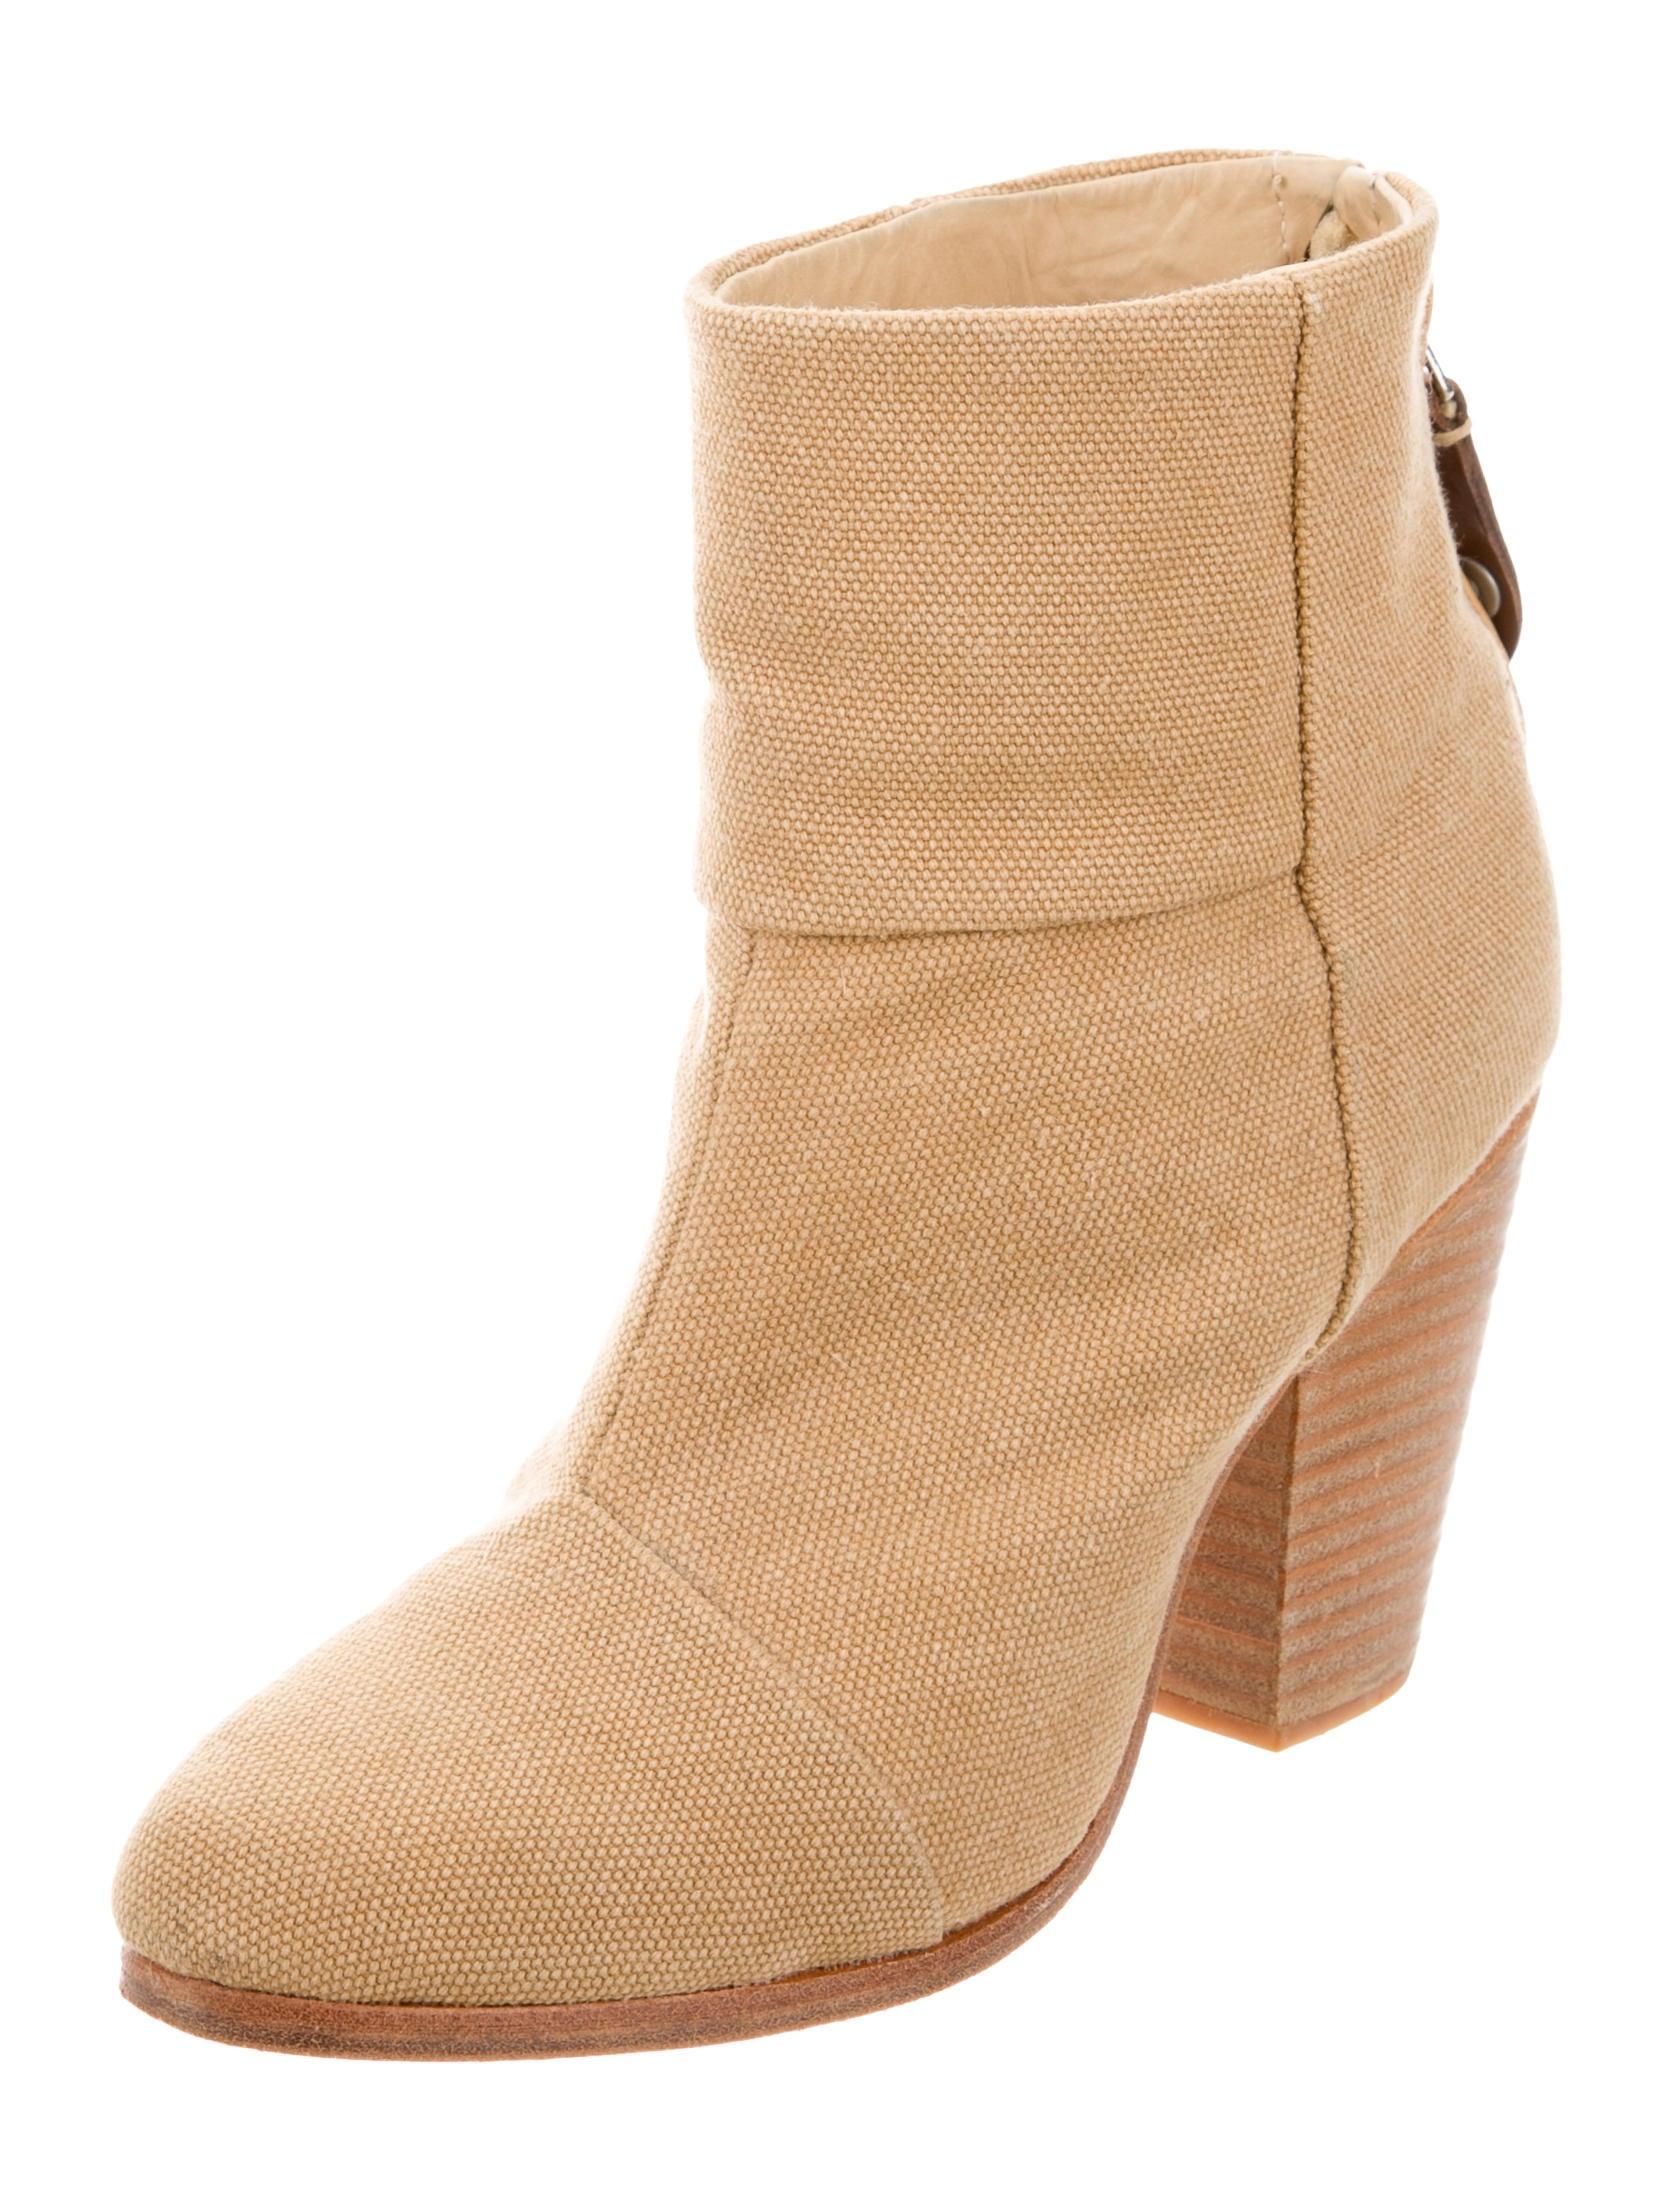 rag bone canvas newbury ankle boots shoes wragb62511